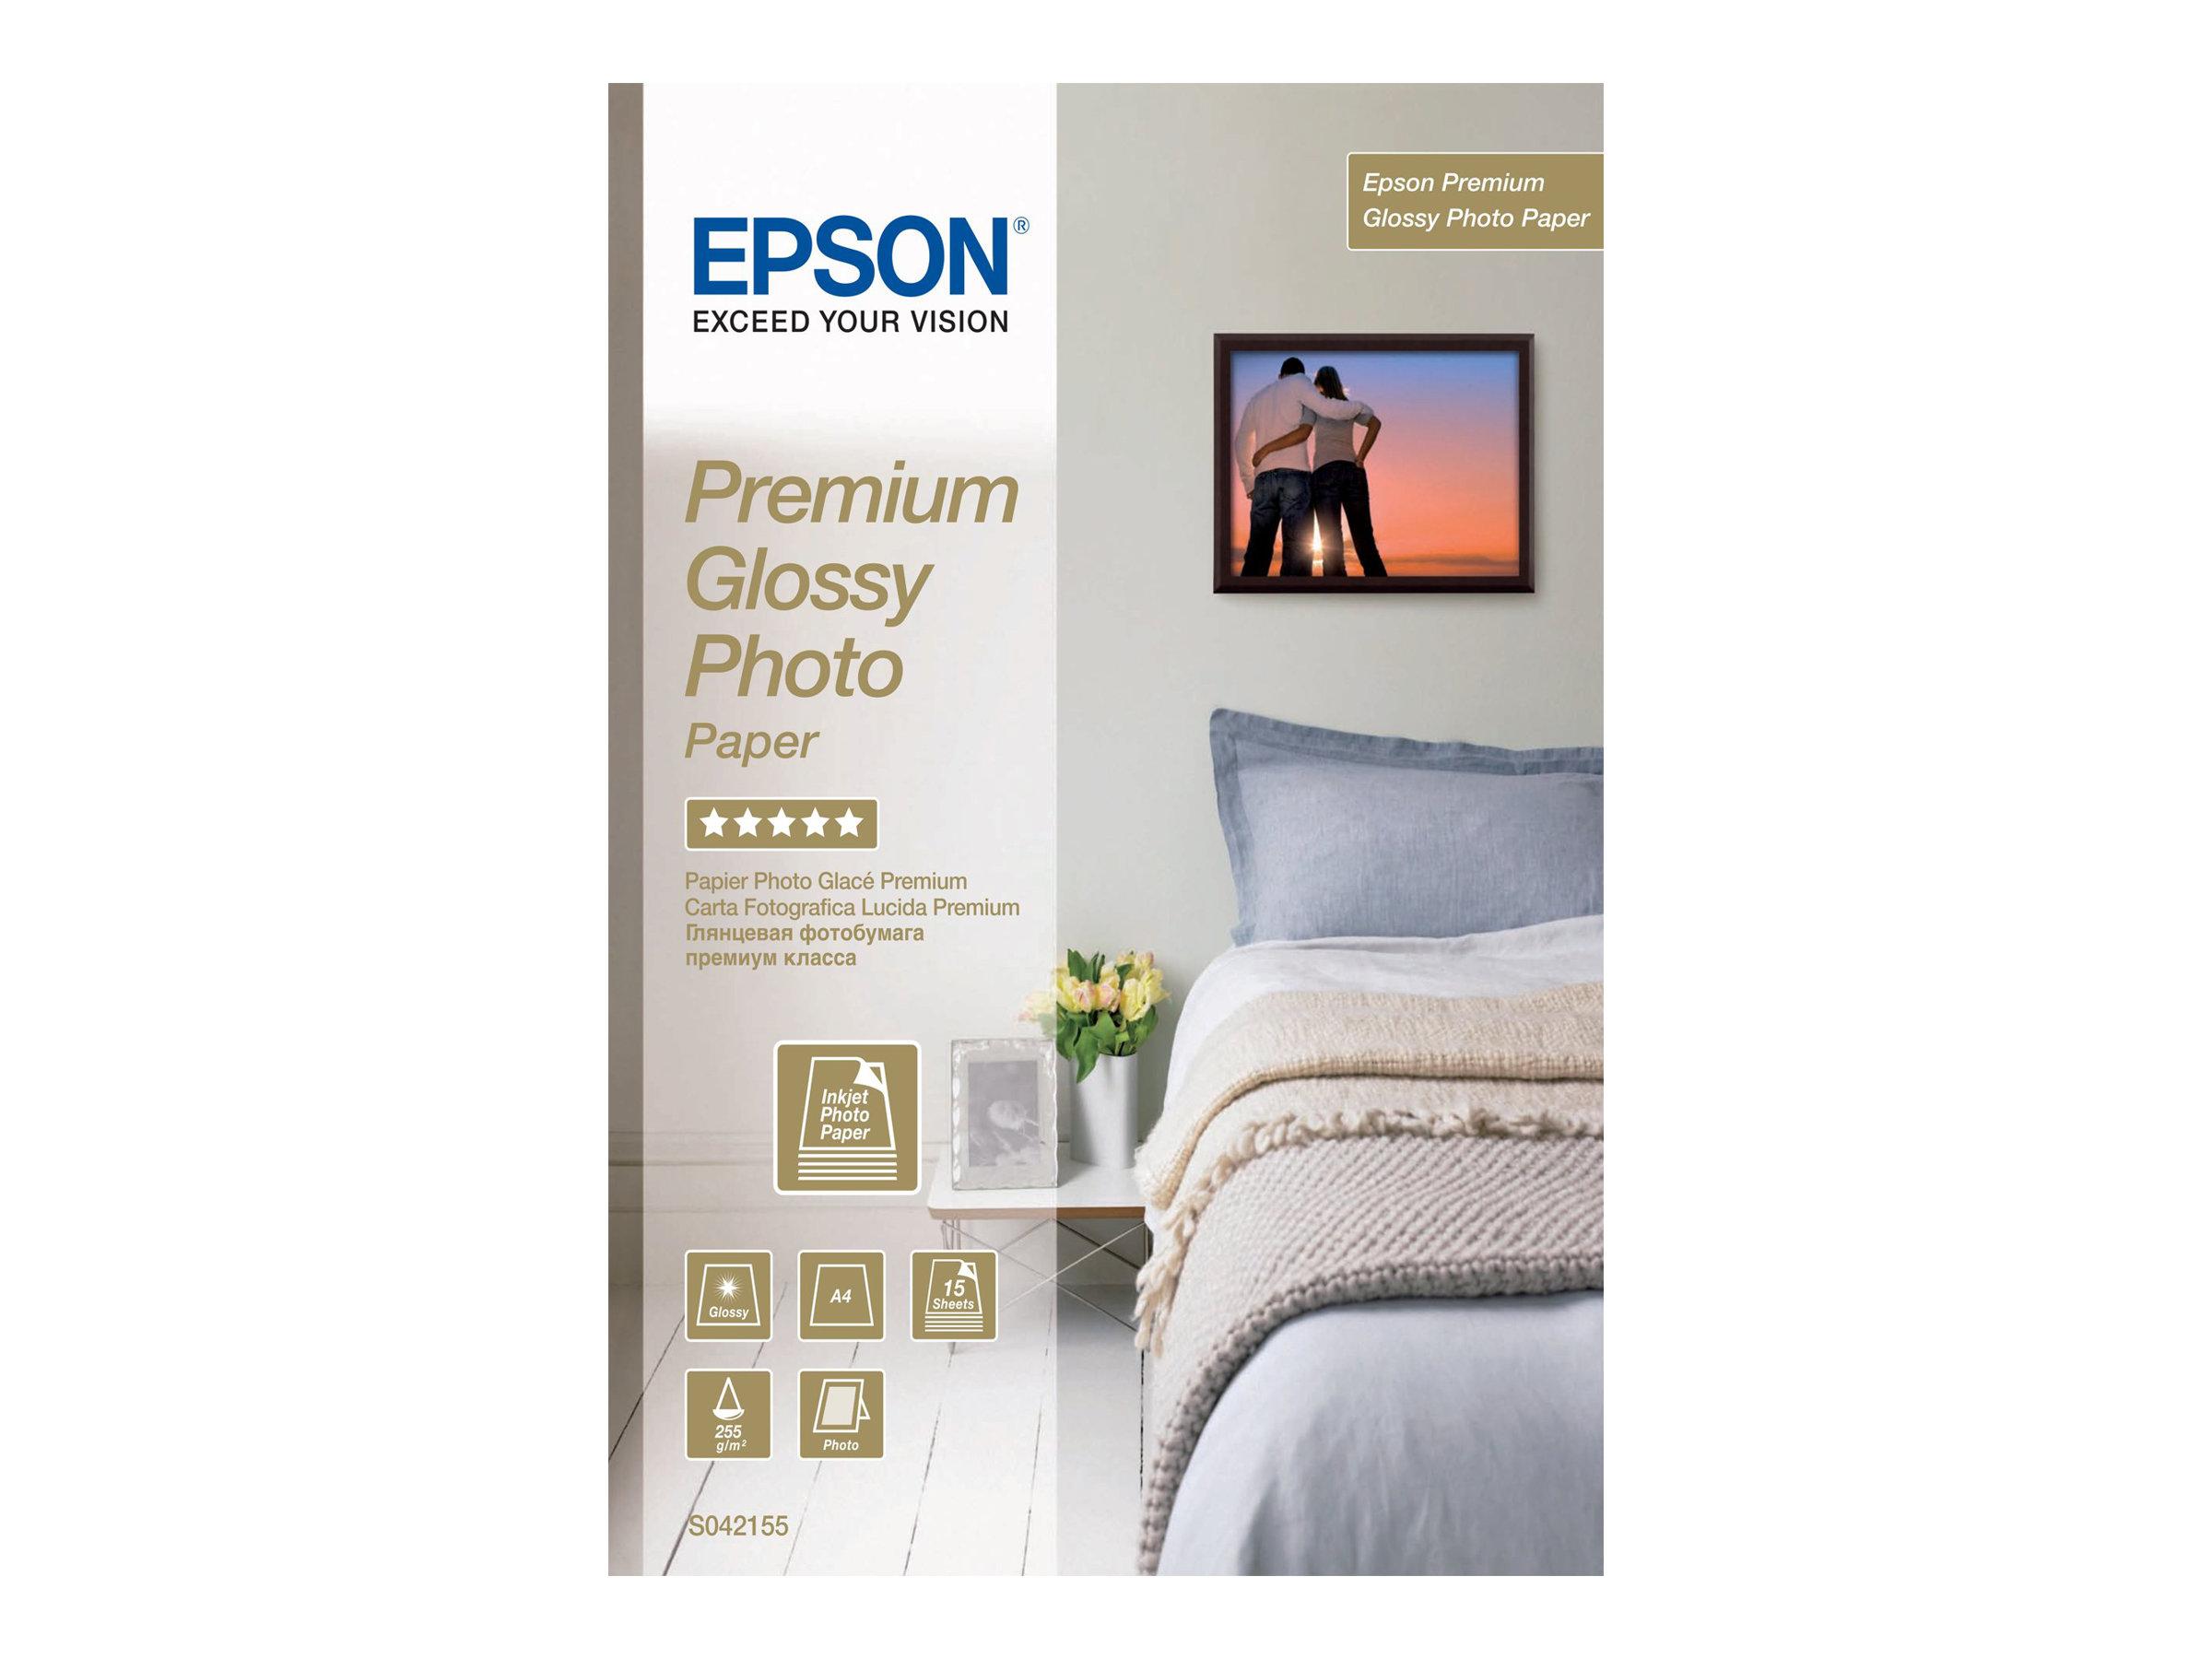 Epson Premium Glossy Photo Paper - papier photo - 15 feuille(s)